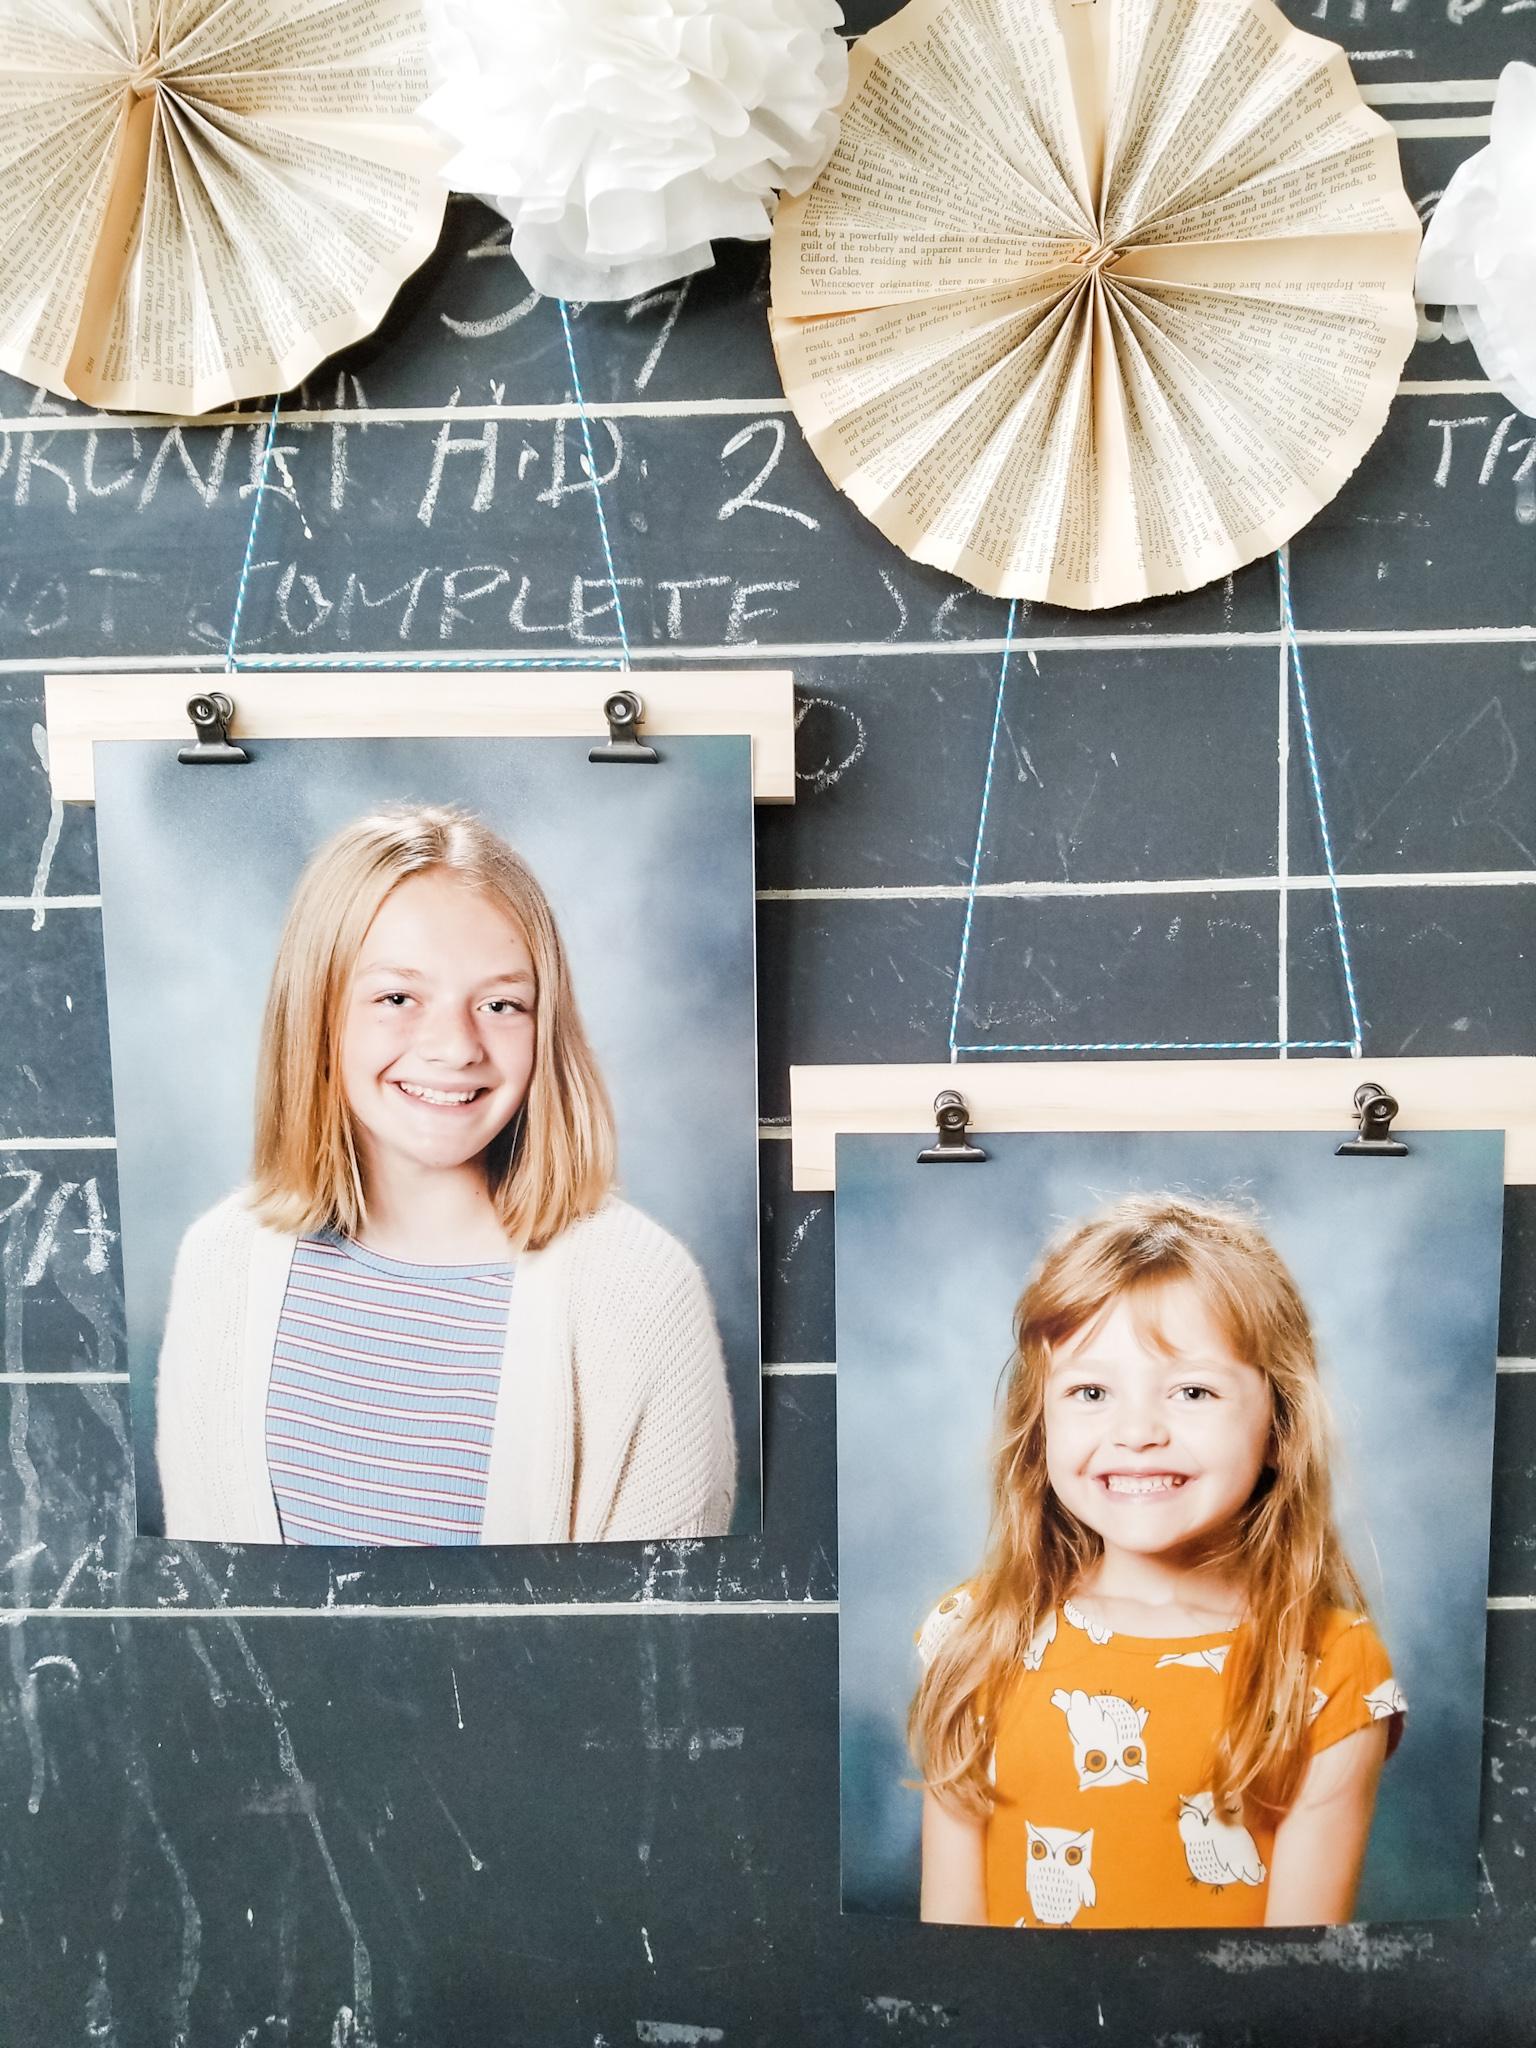 school house style photo frames